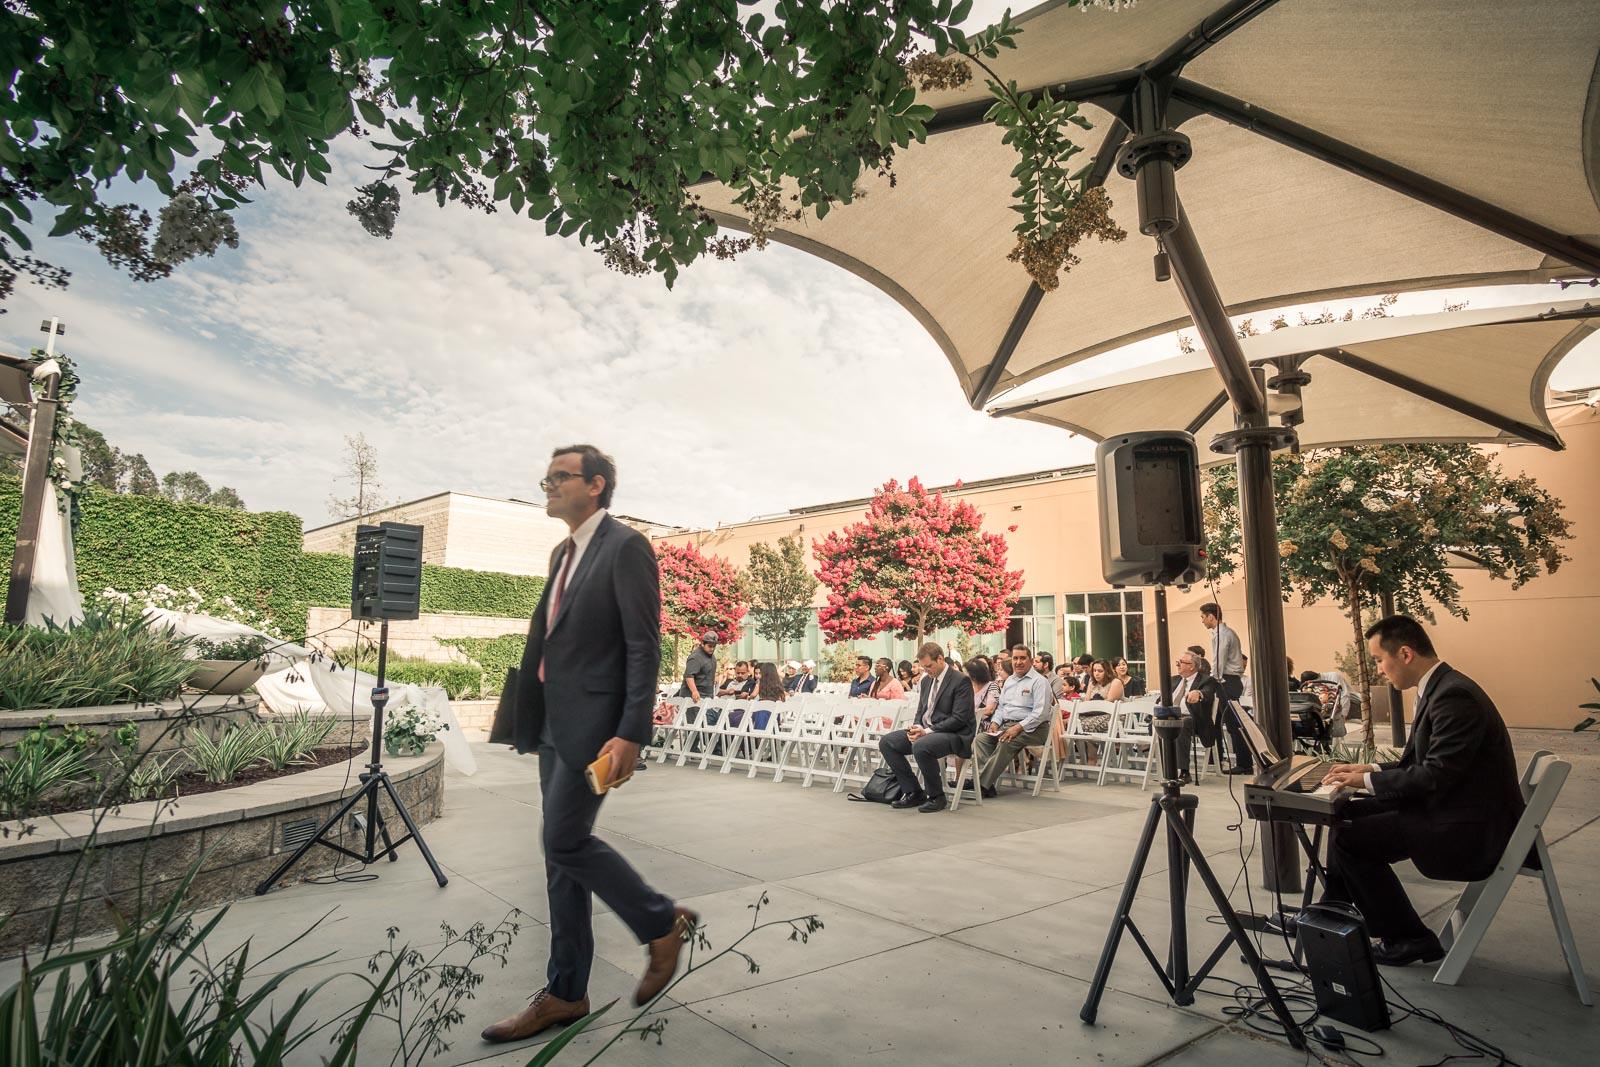 109_Angel-Brea-Orange-County_Joseph-Barber-Wedding-Photography.jpg